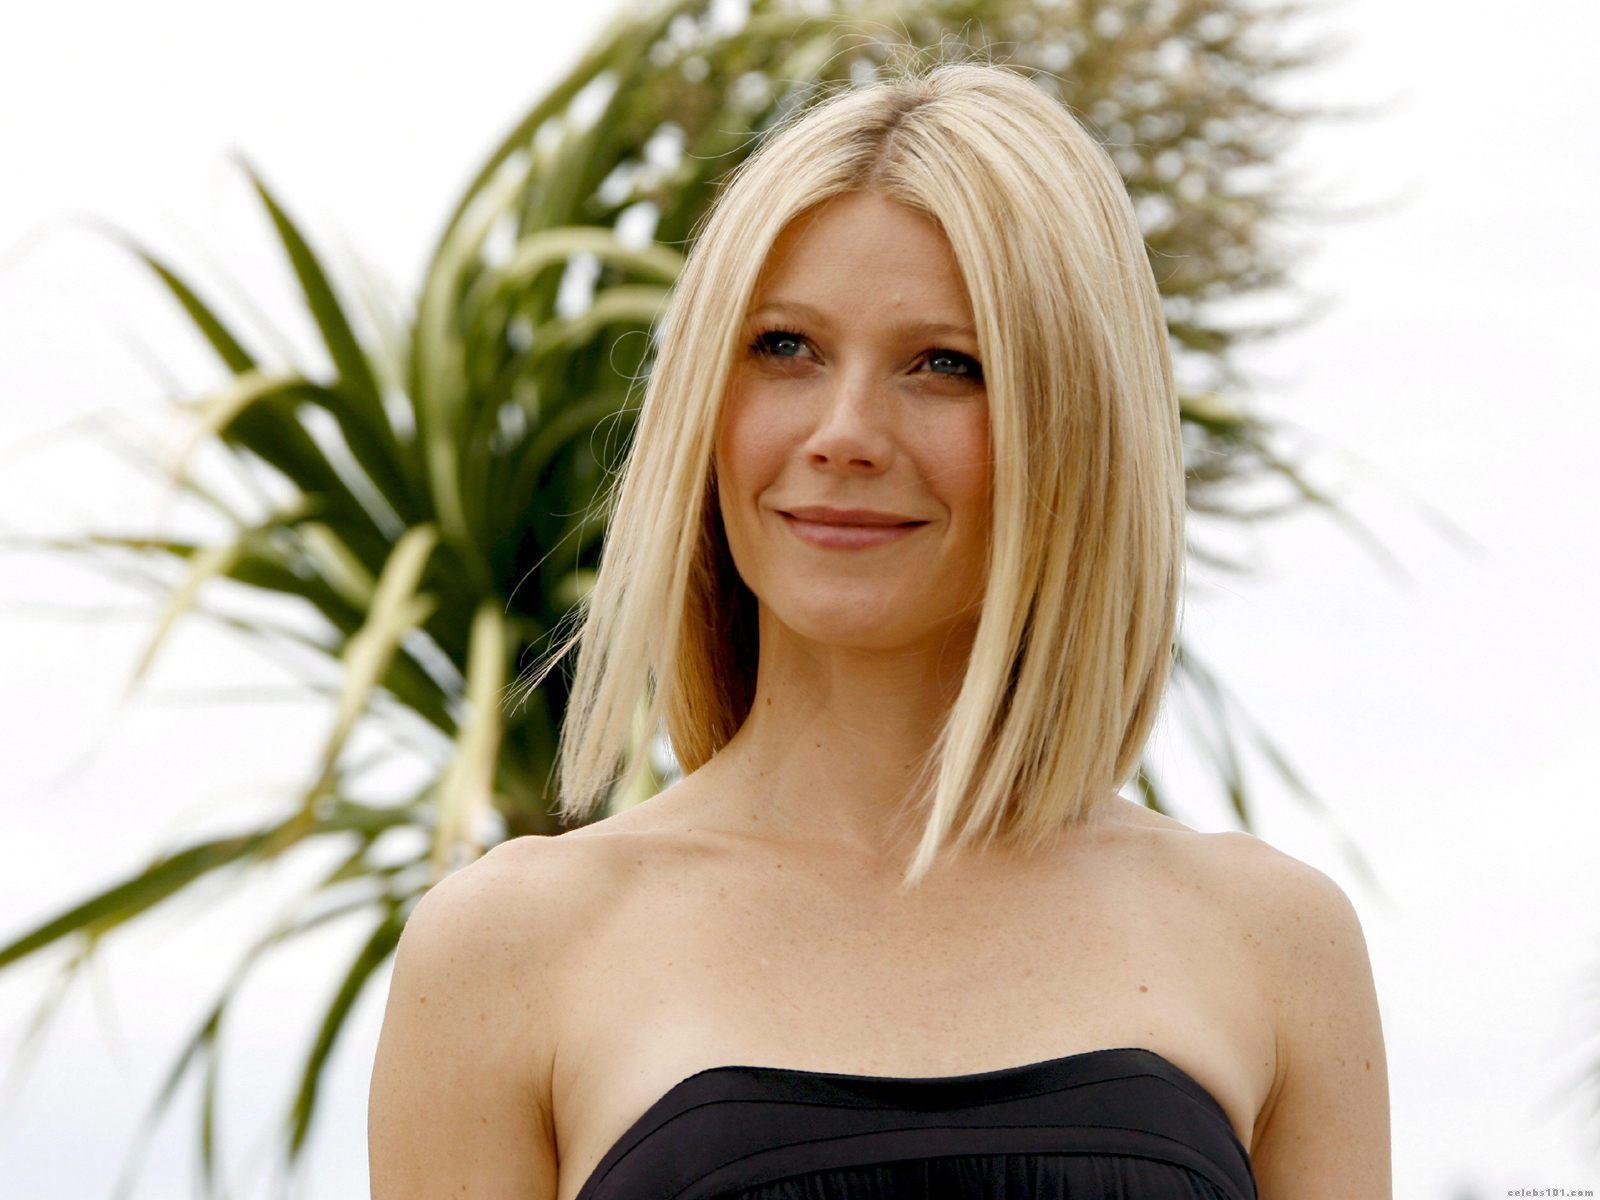 http://4.bp.blogspot.com/-yA_f9tLYcz0/T7IcNS3_X-I/AAAAAAAAAzk/1FLGFEhnC3Q/s1600/Gwyneth_Paltrow_Wallpaper.jpg